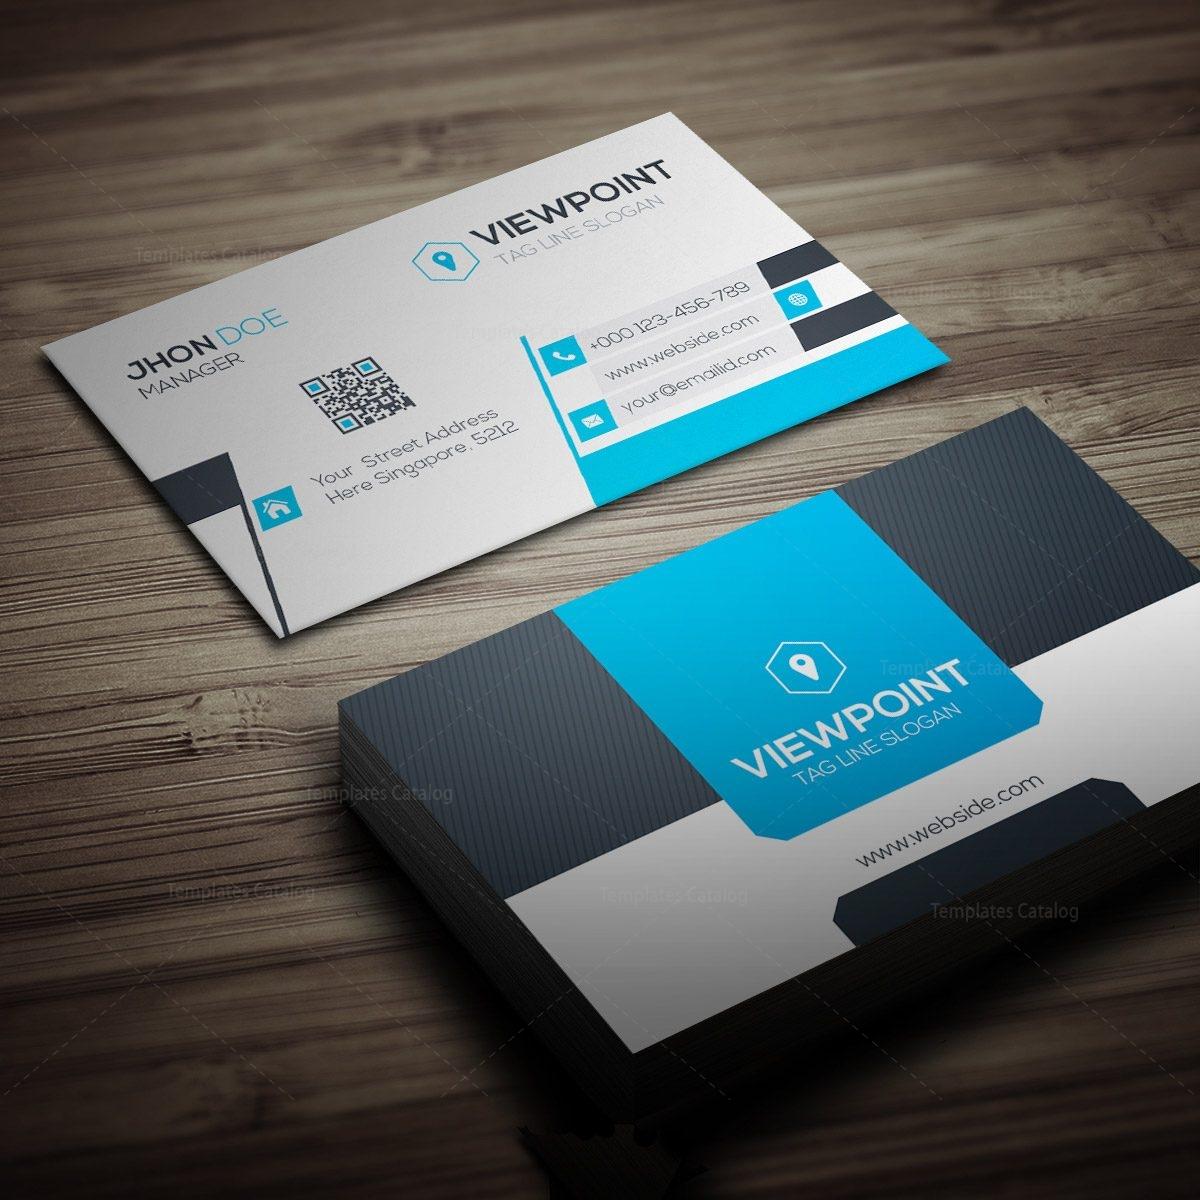 Market Business Card Template 000274 - Template Catalog